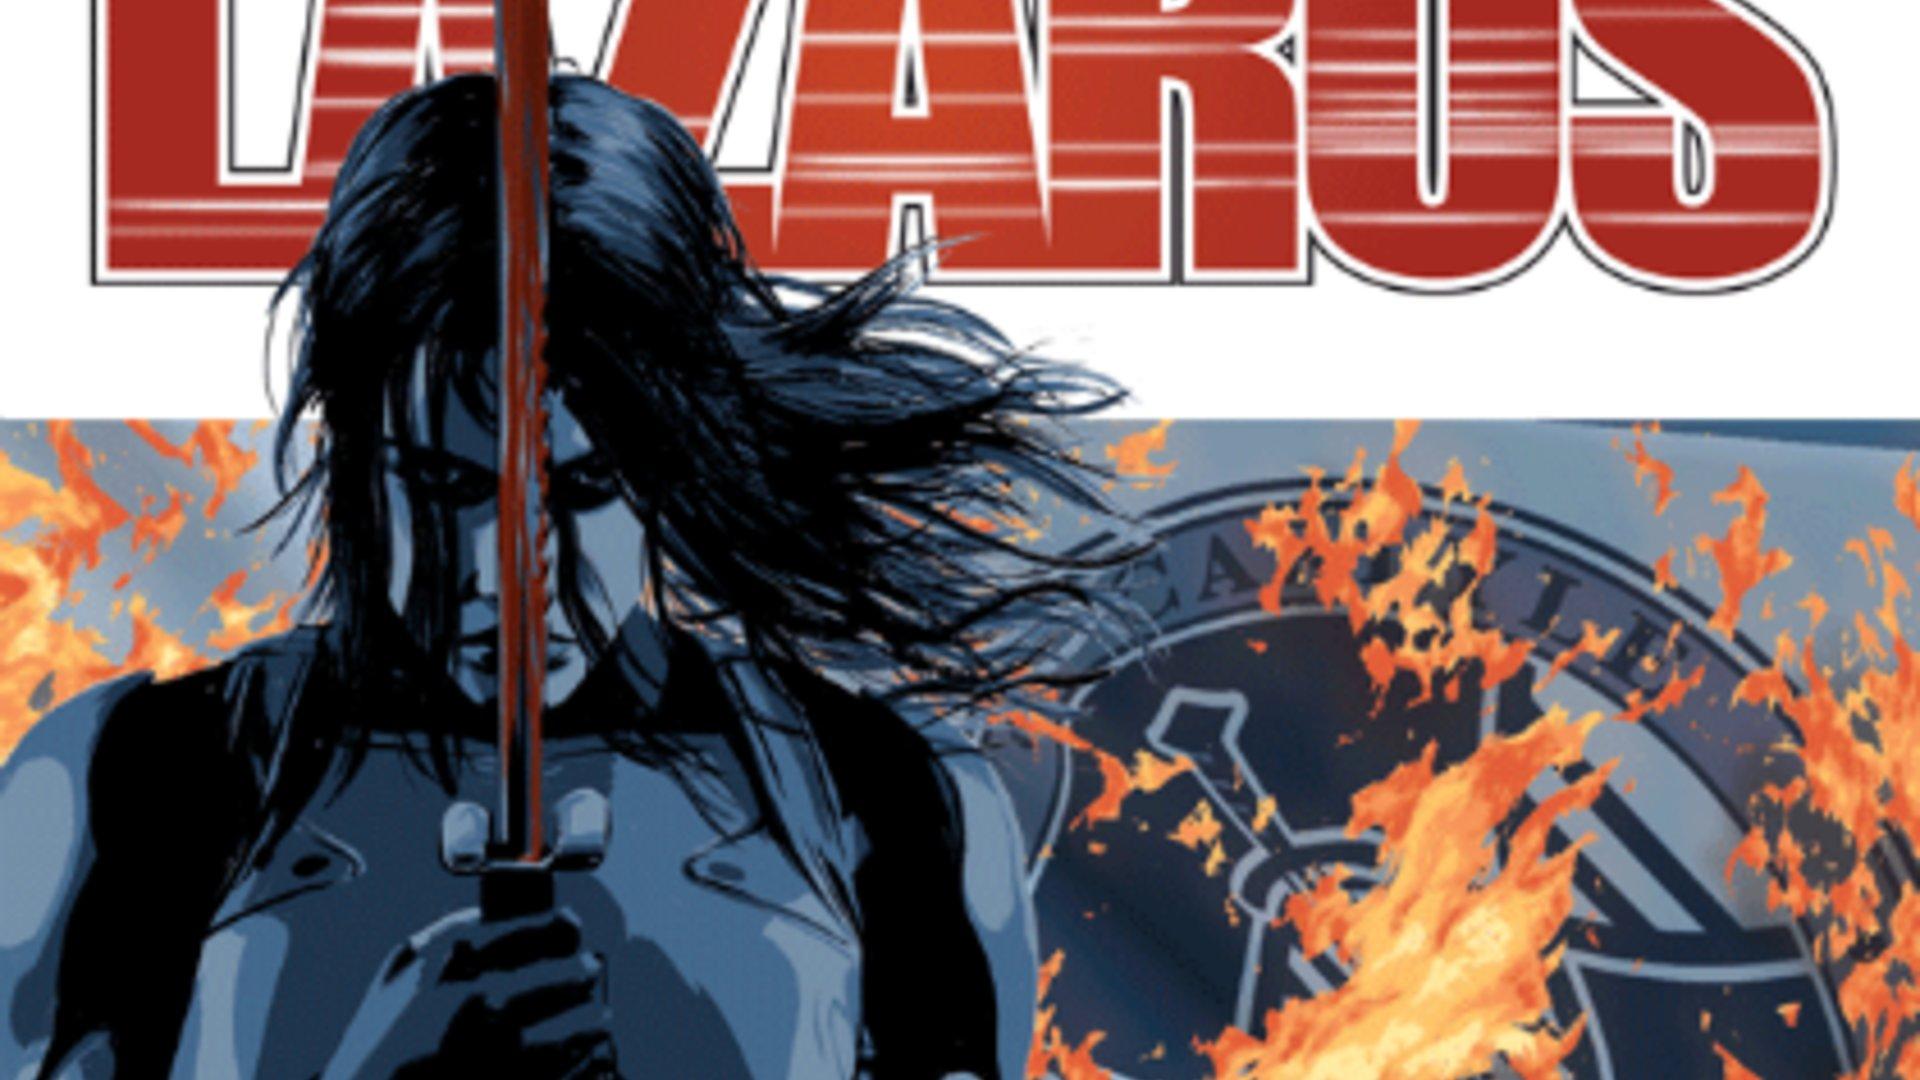 13 Lazarus Serien Adaption des Greg Rucka Comics auf Amazon · KINO.de